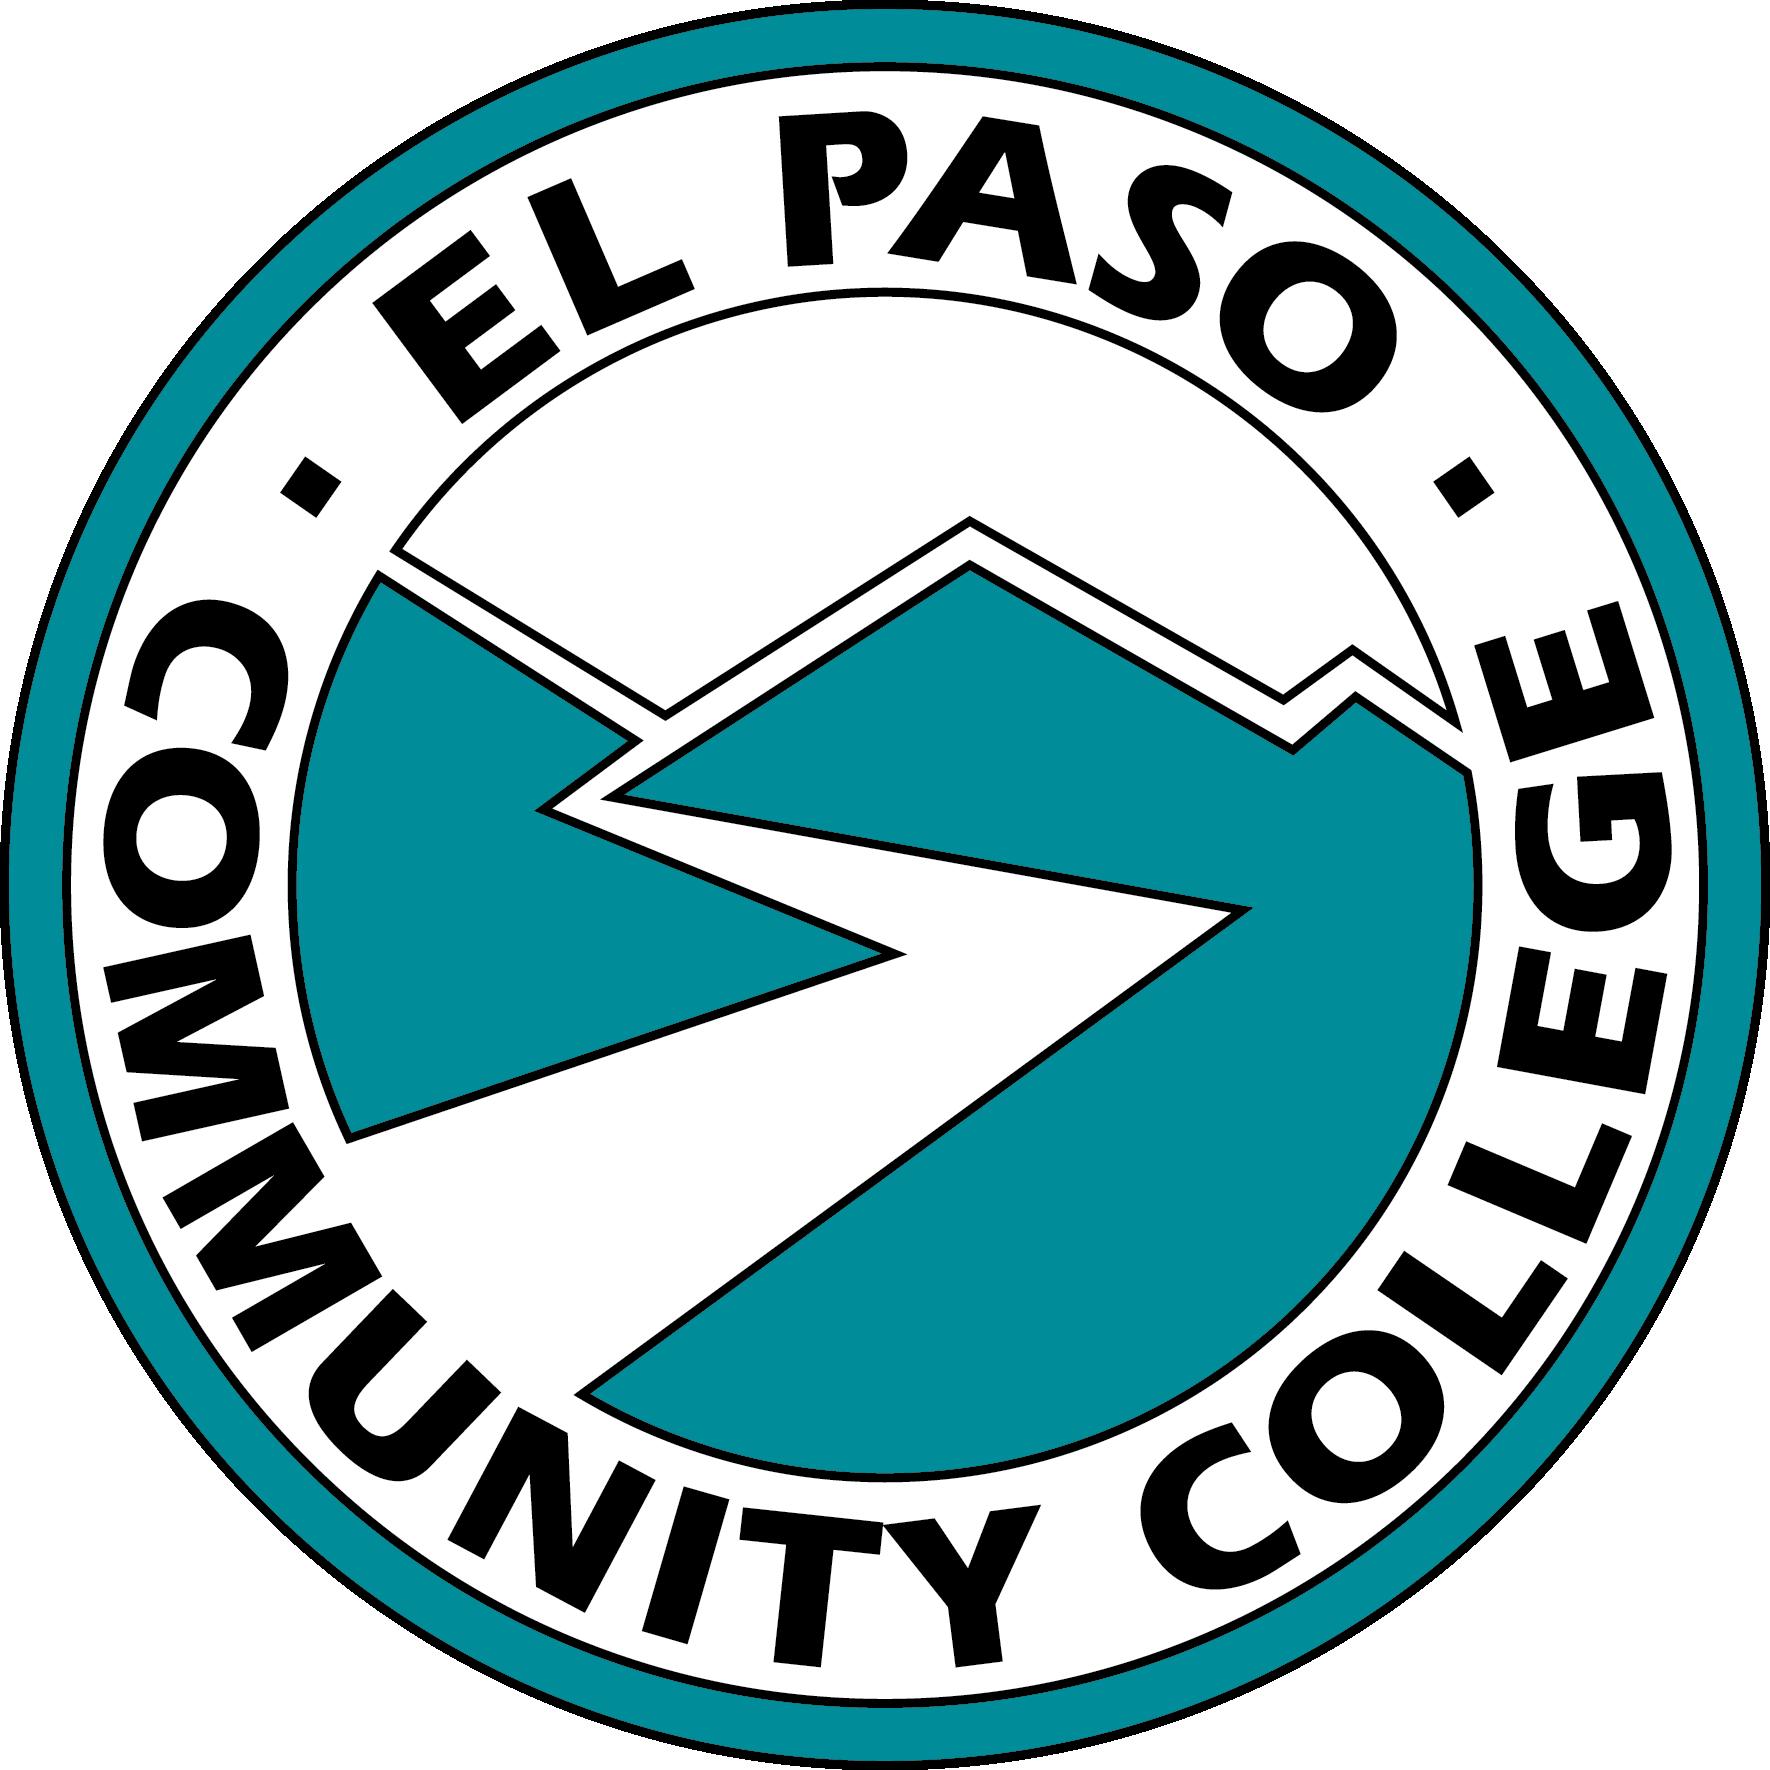 EPCC_logo-png165557.png